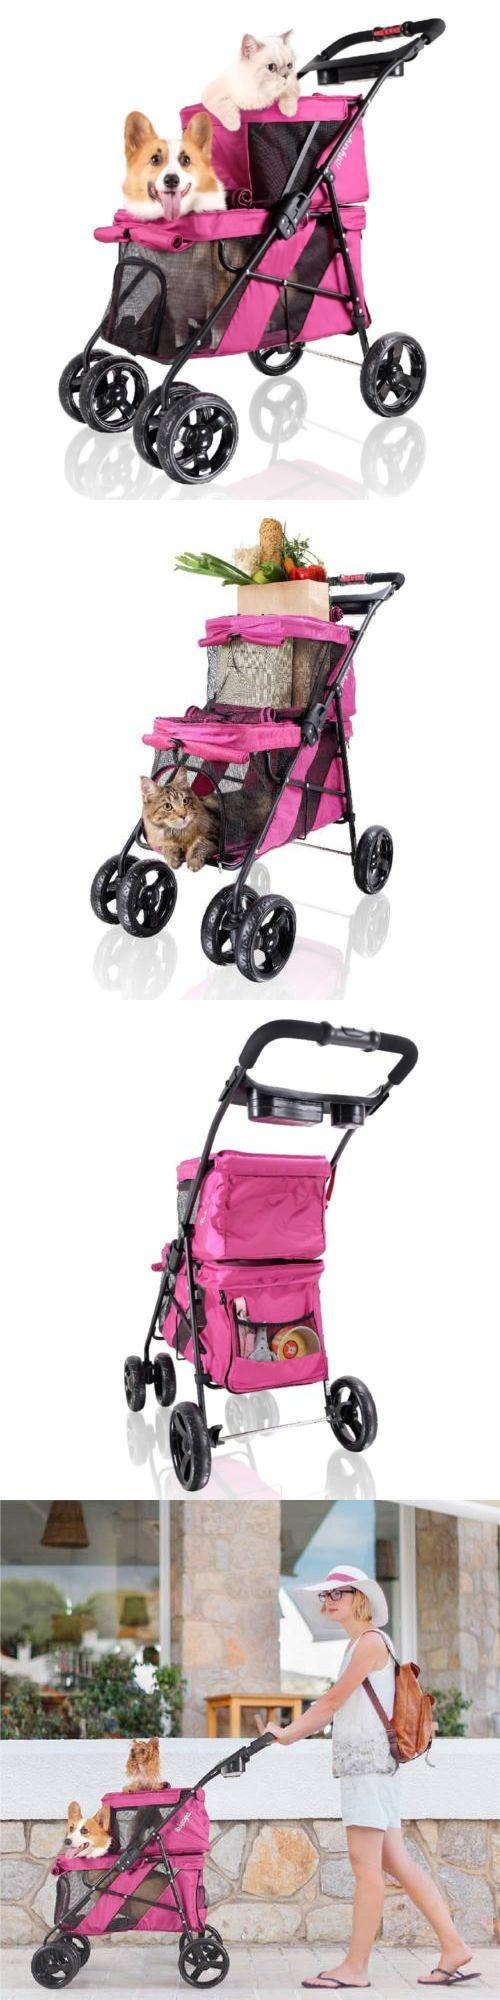 Strollers 116380 Ibiyaya 4 Wheel Double Pet Stroller For